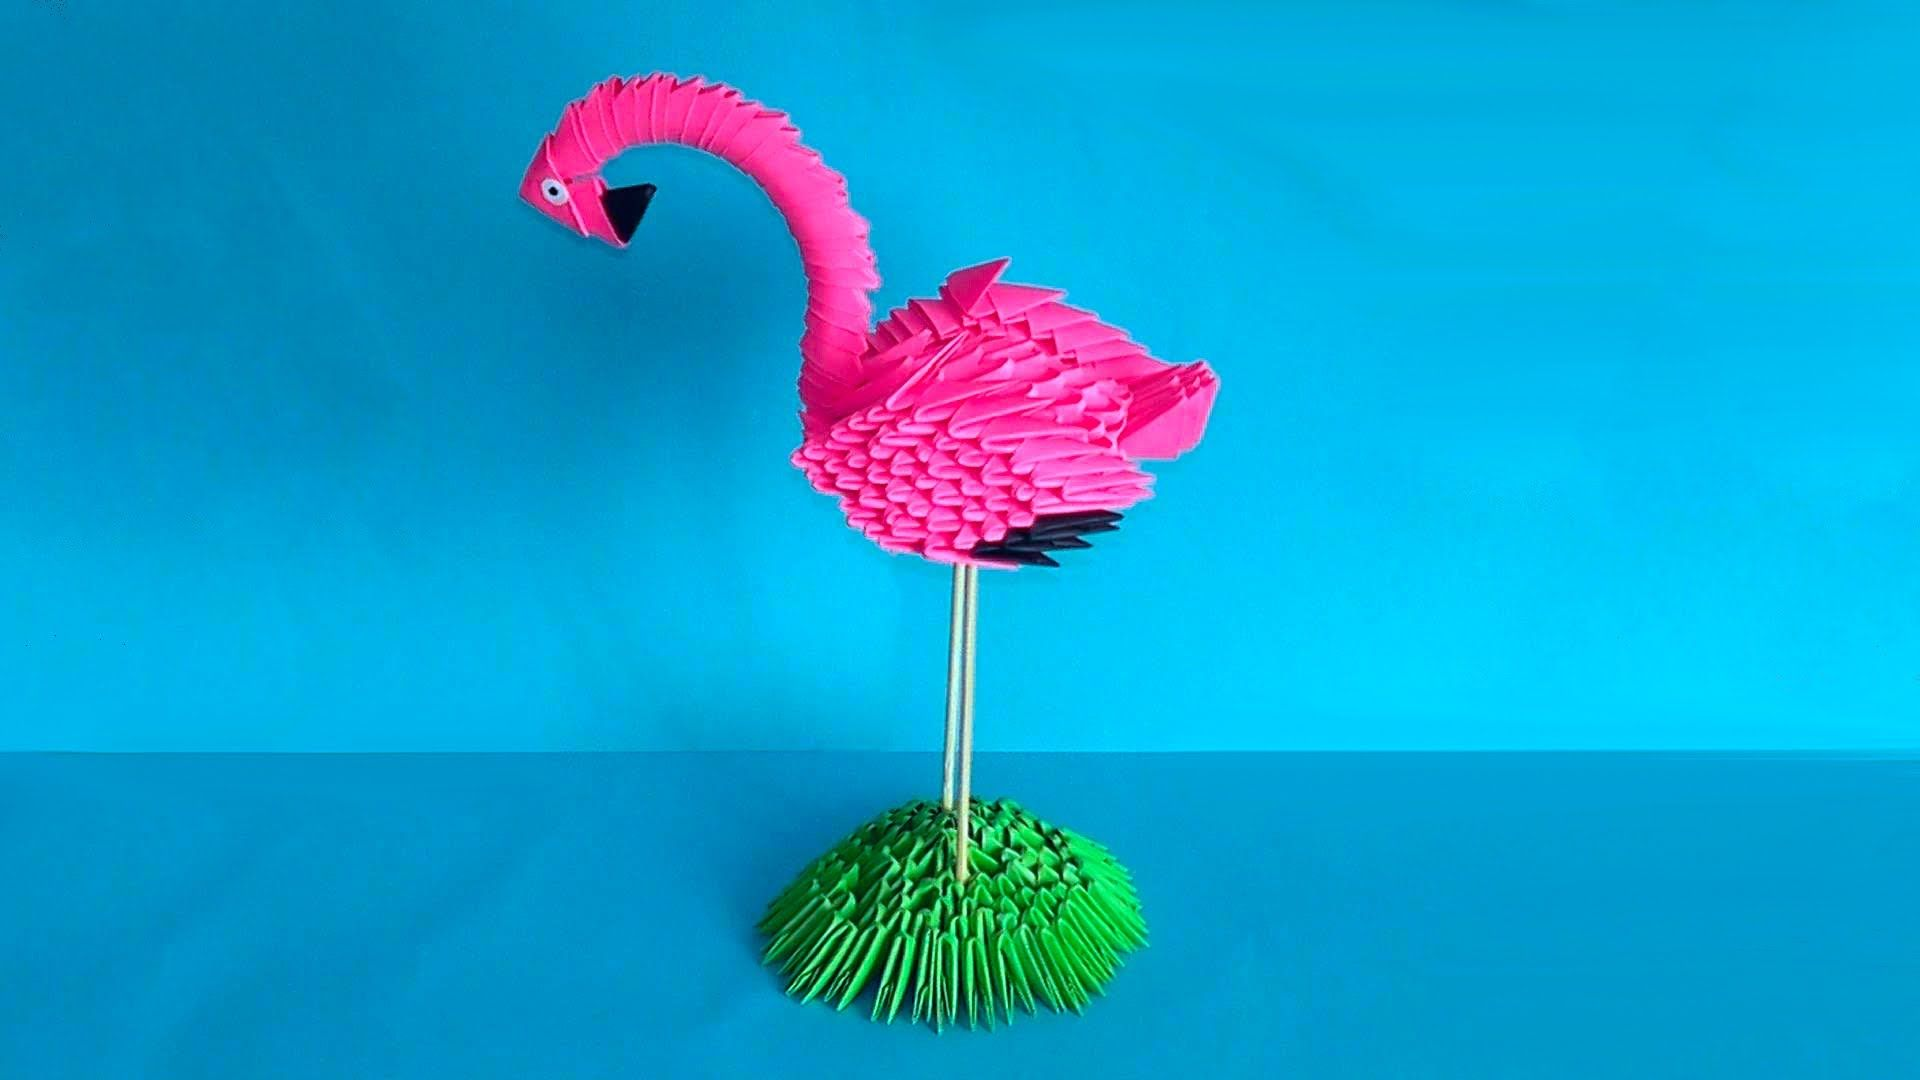 How to make 3d origami bird flamingo master class tutorial http how to make 3d origami bird flamingo master class tutorial http jeuxipadfo Images